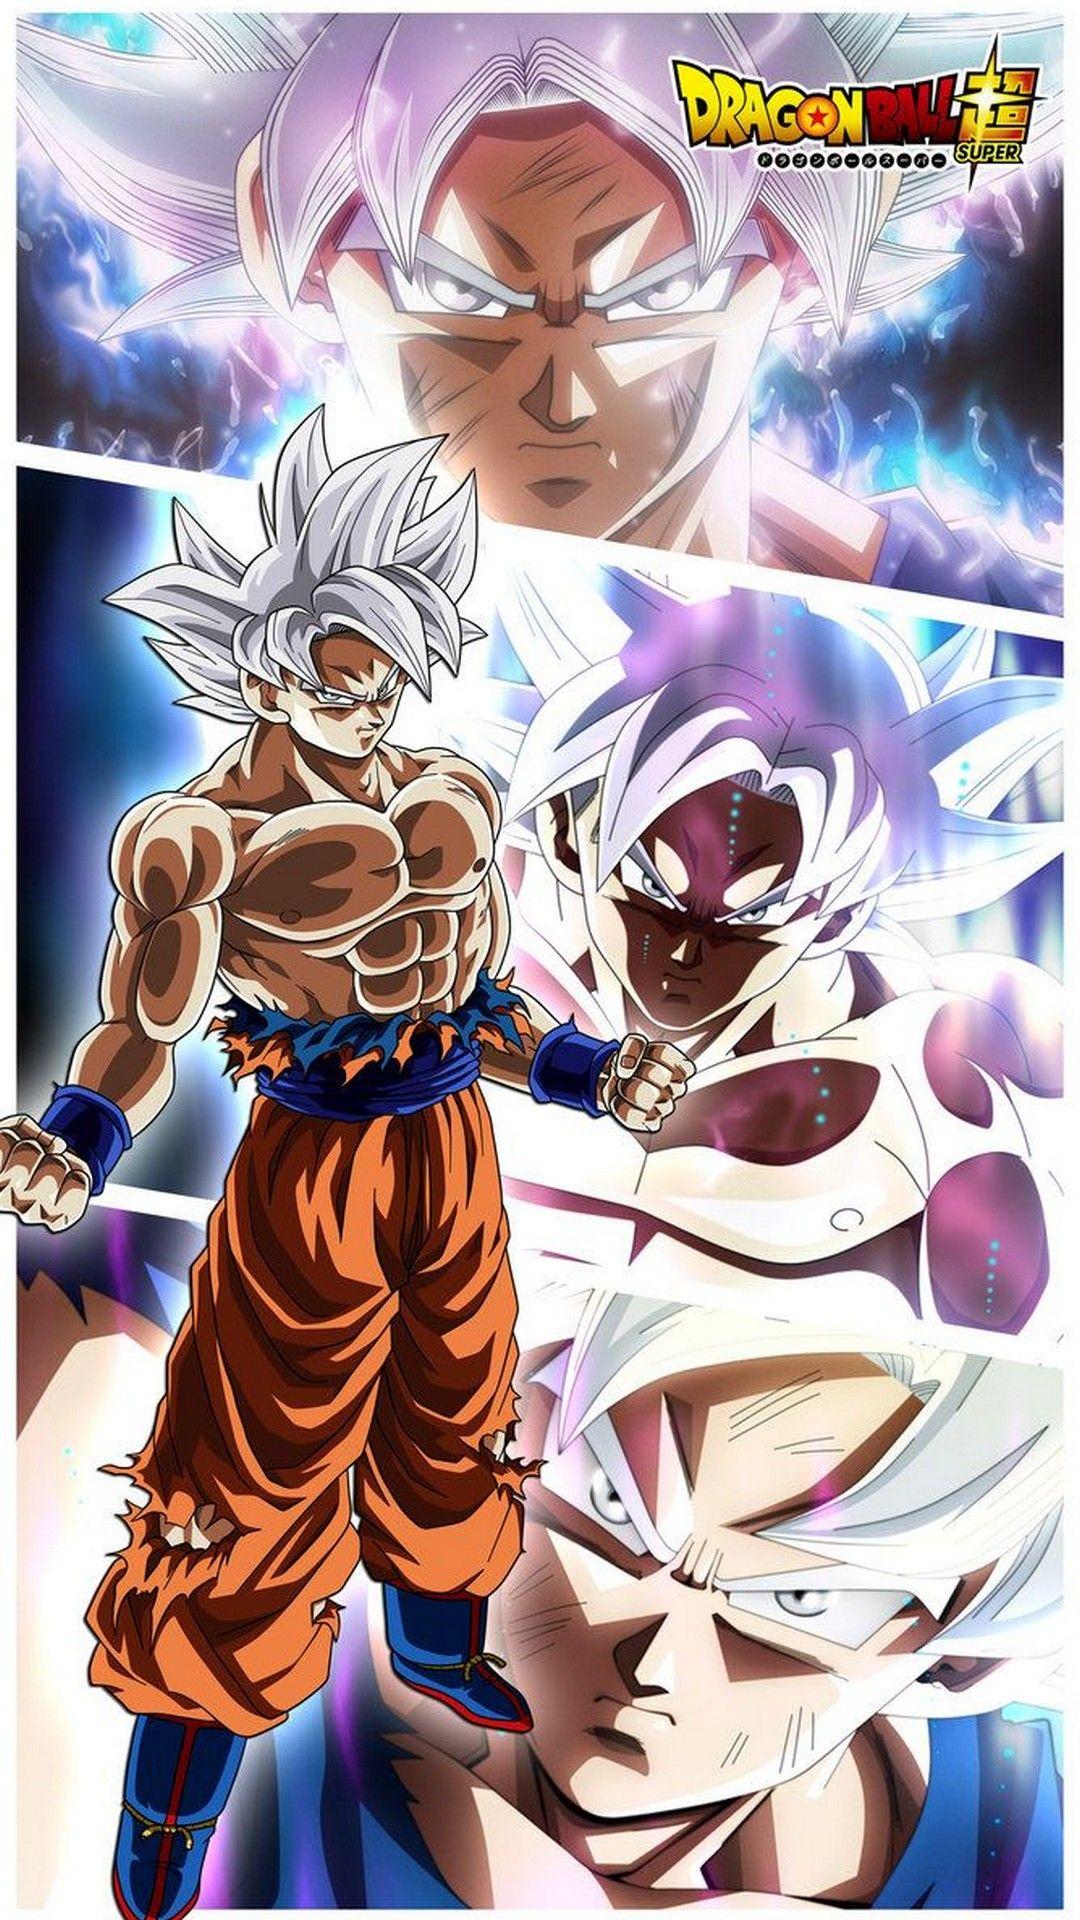 Goku Ultra Instinct Wallpaper Iphone X 1080x1920 Wallpaper Teahub Io